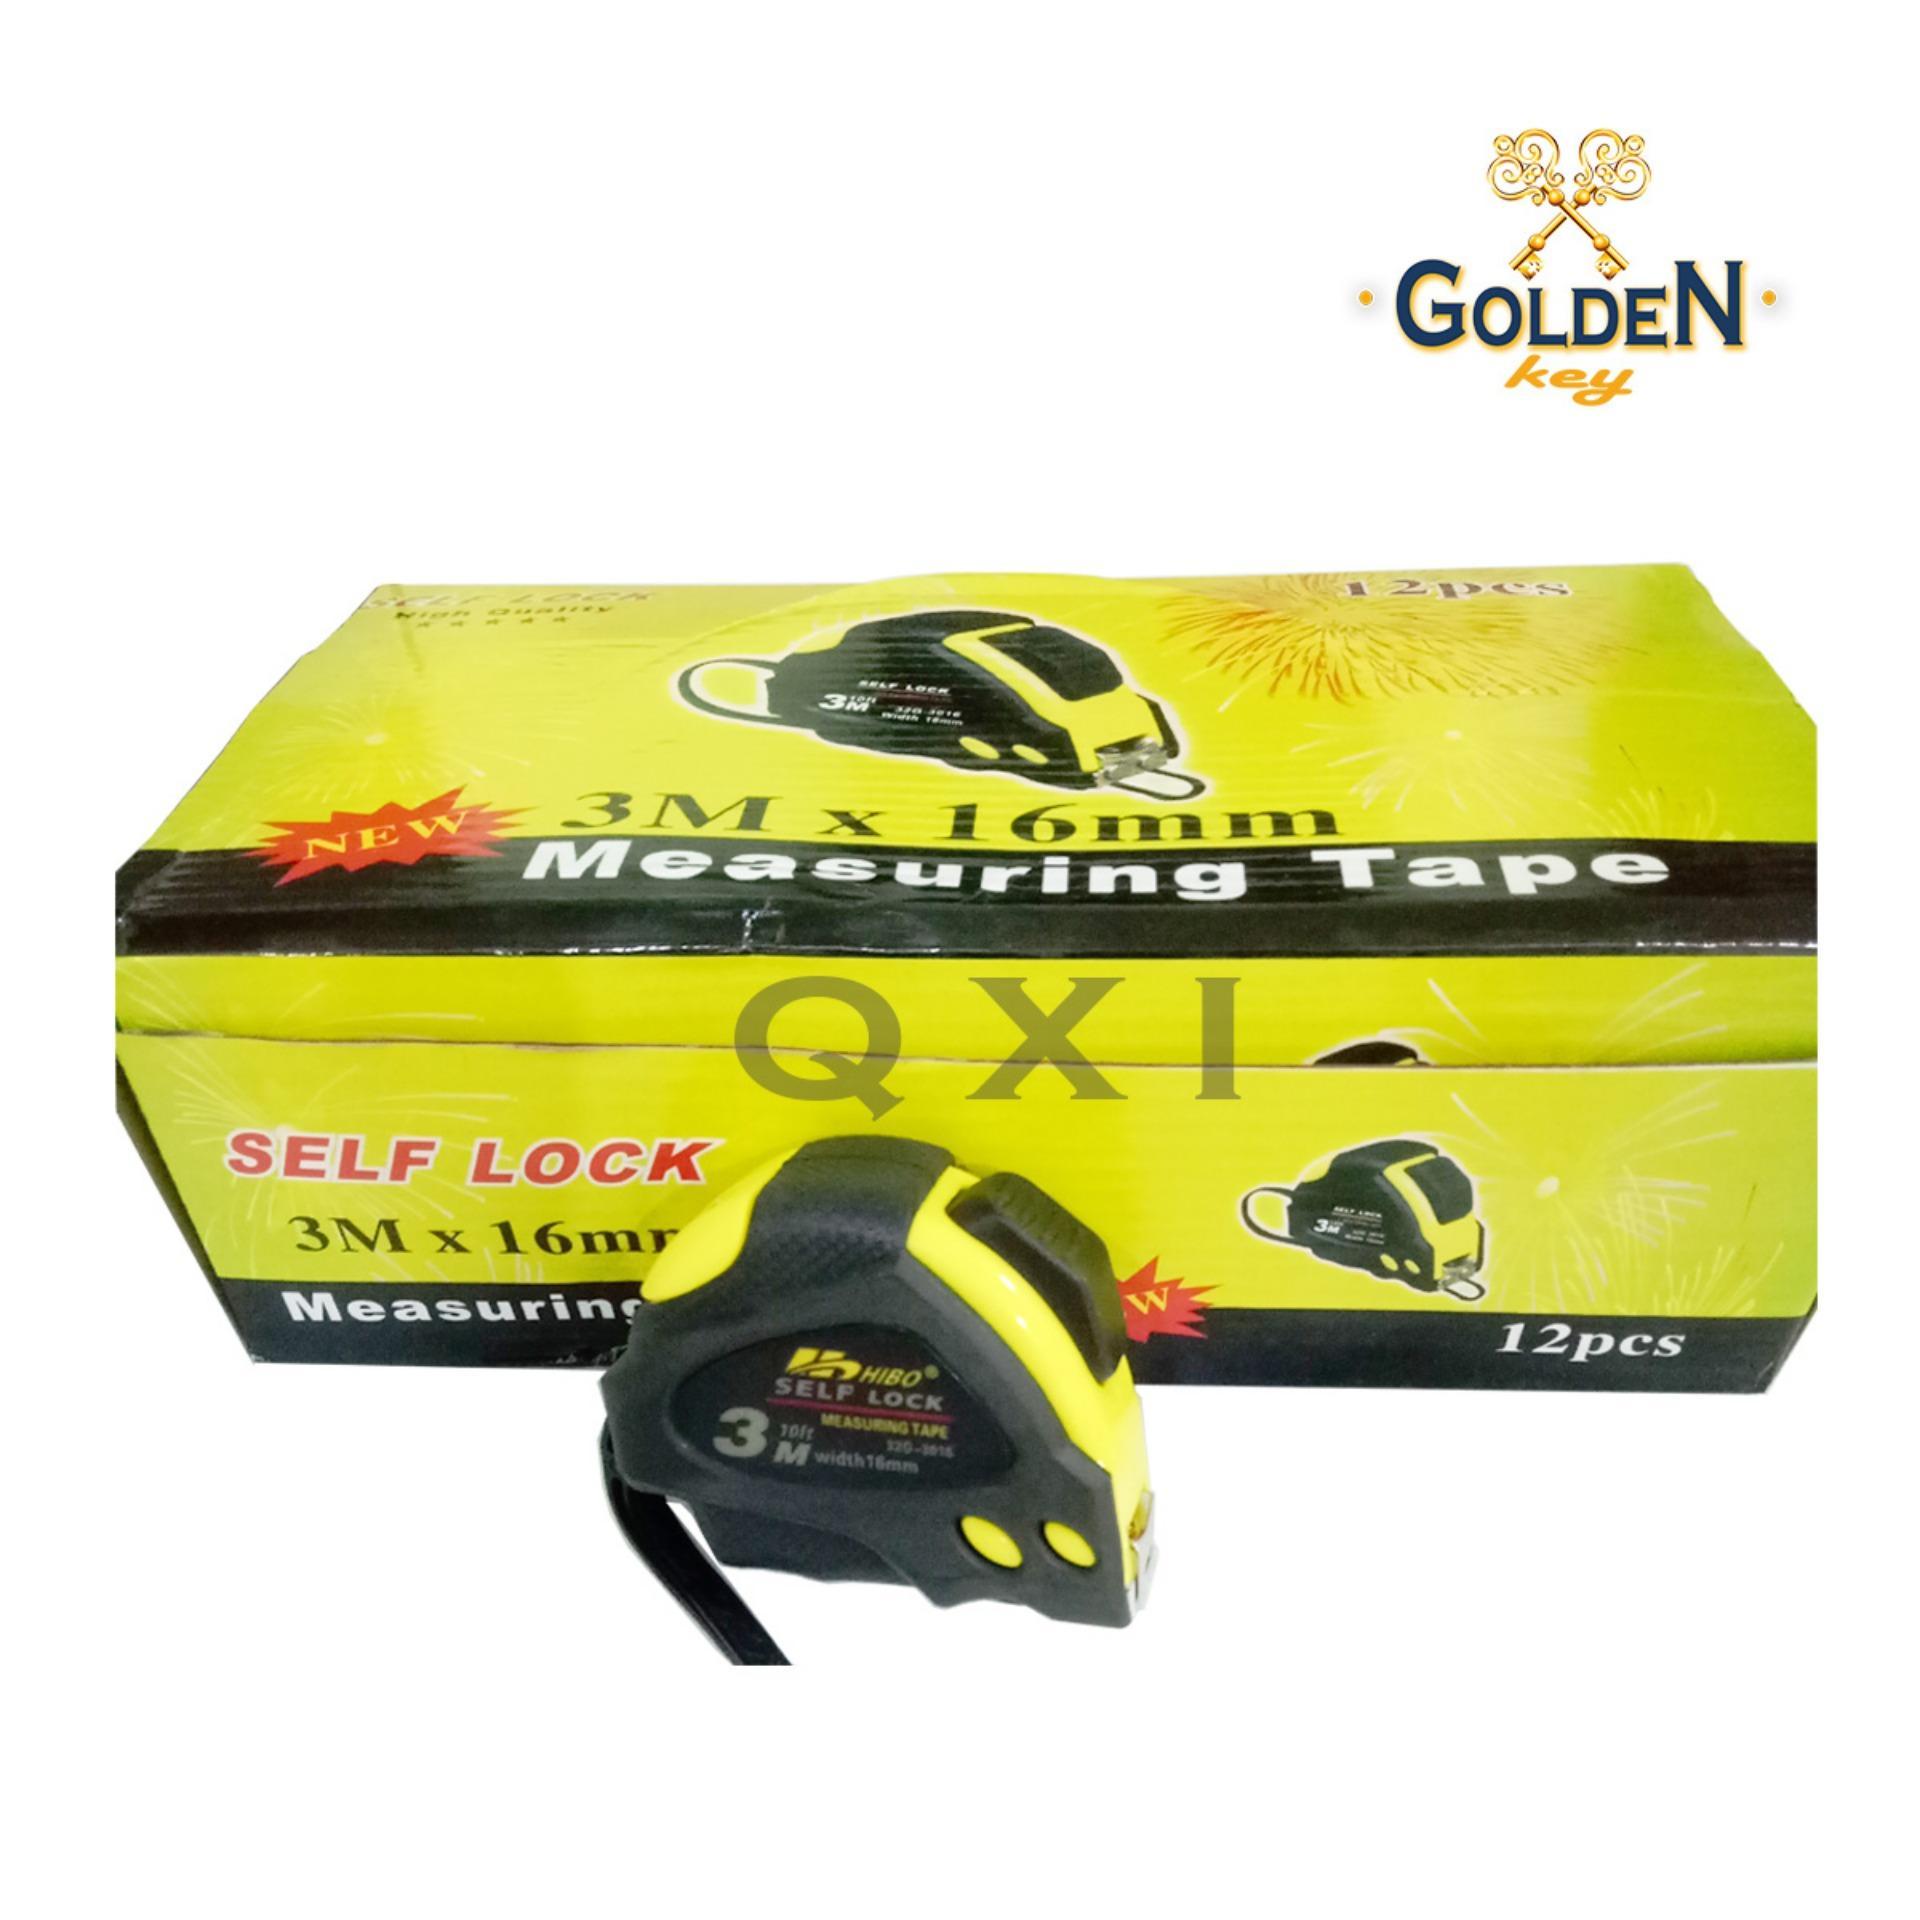 Buy Sell Cheapest Meteran Measuring Tape Best Quality Product Hi Lock Tajima 5mtr Japan Roll Hibo 3 M Meter